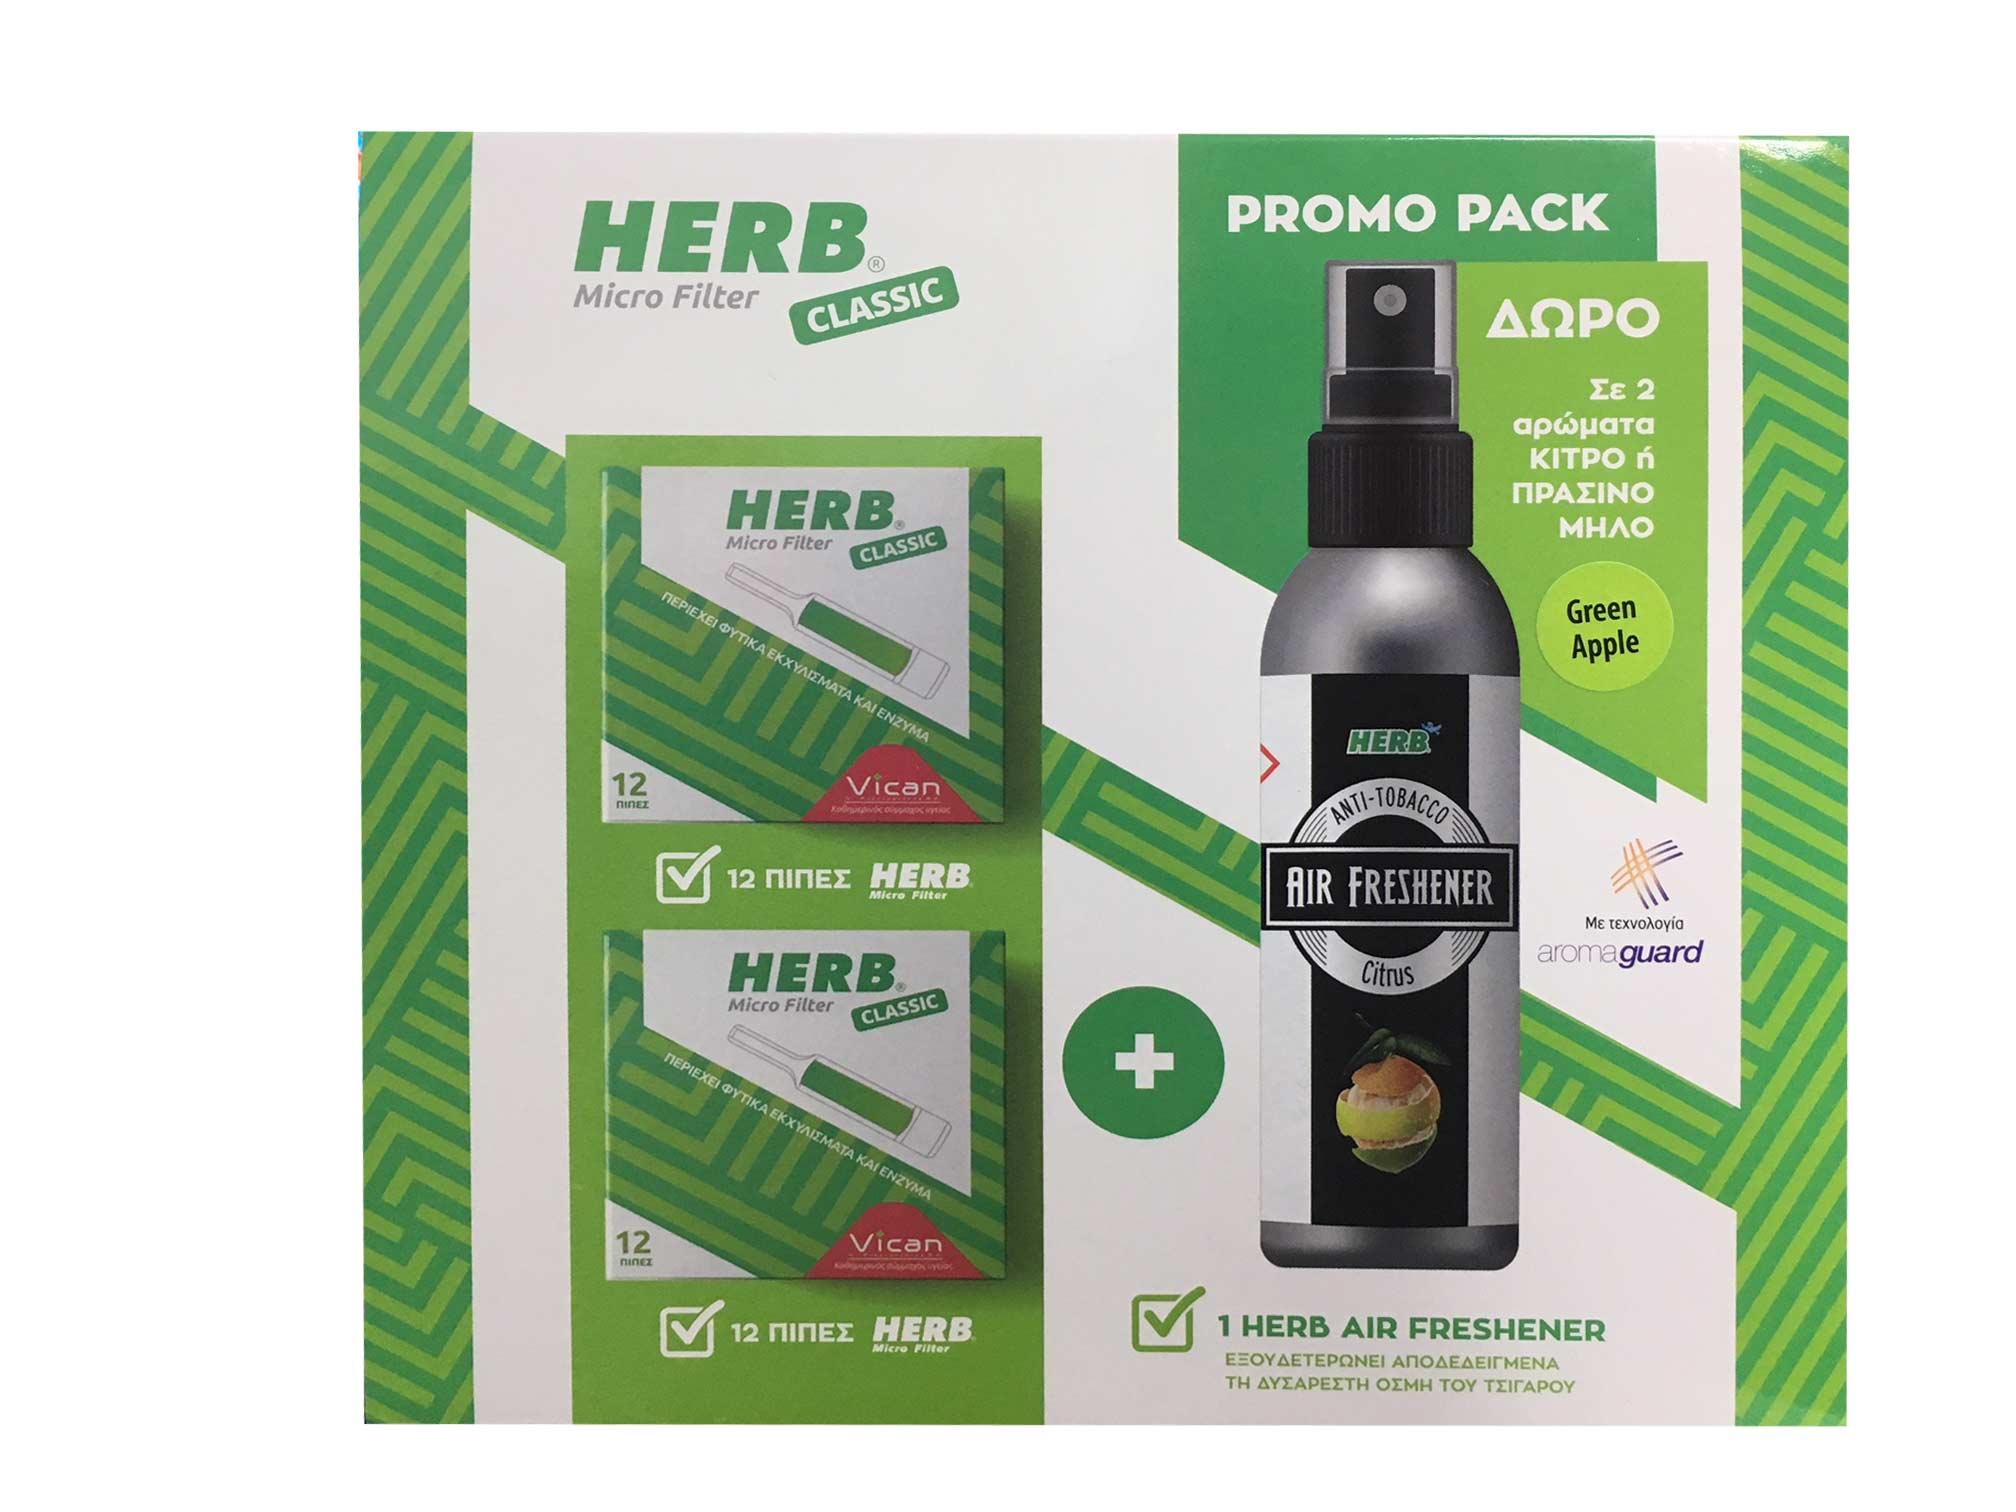 Herb Πίπες PROMO PACK με Micro Filter Ανταλλακτικά Φίλτρα για Κανονικό Τσιγάρο, 2 x 12 τεμάχια & ΔΩΡΟ Herb Air Freshener Αποσμητικό Χώρου που εξουδετερώνει την Οσμή του Τσιγάρου με Άρωμα Πράσινο Μήλο, 75ml